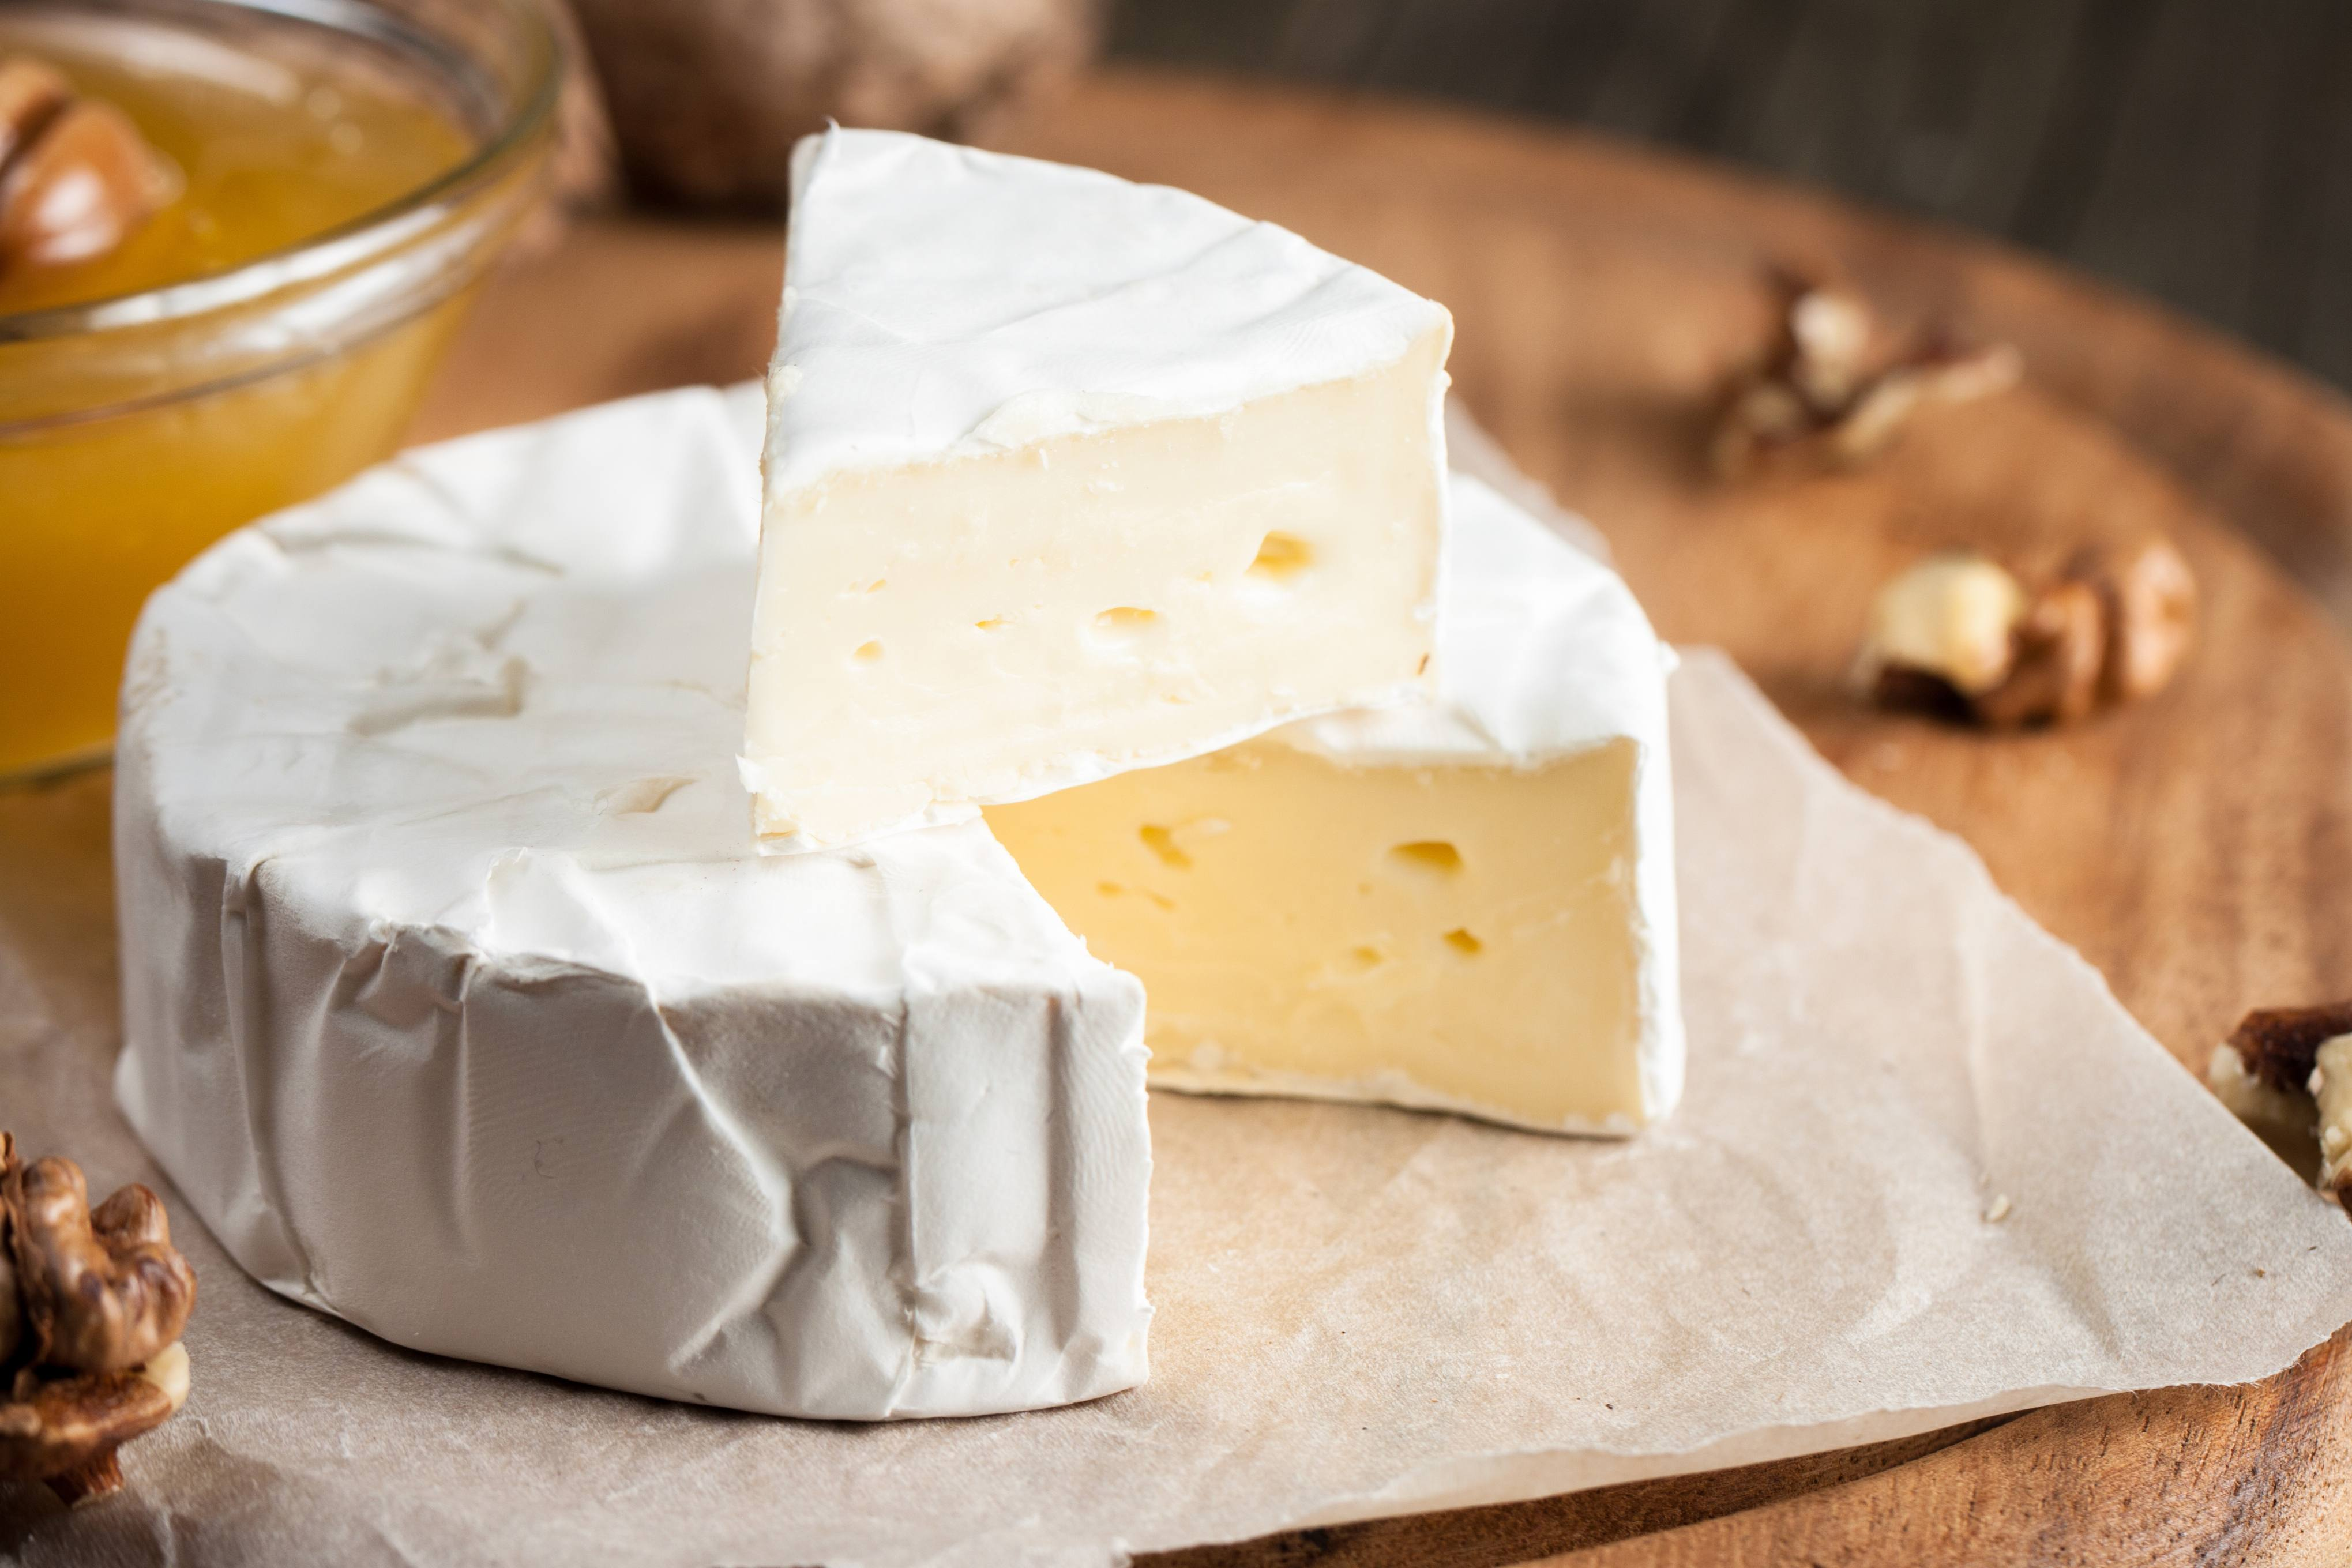 a fresh brie cheese wheel on a wooden cutting board